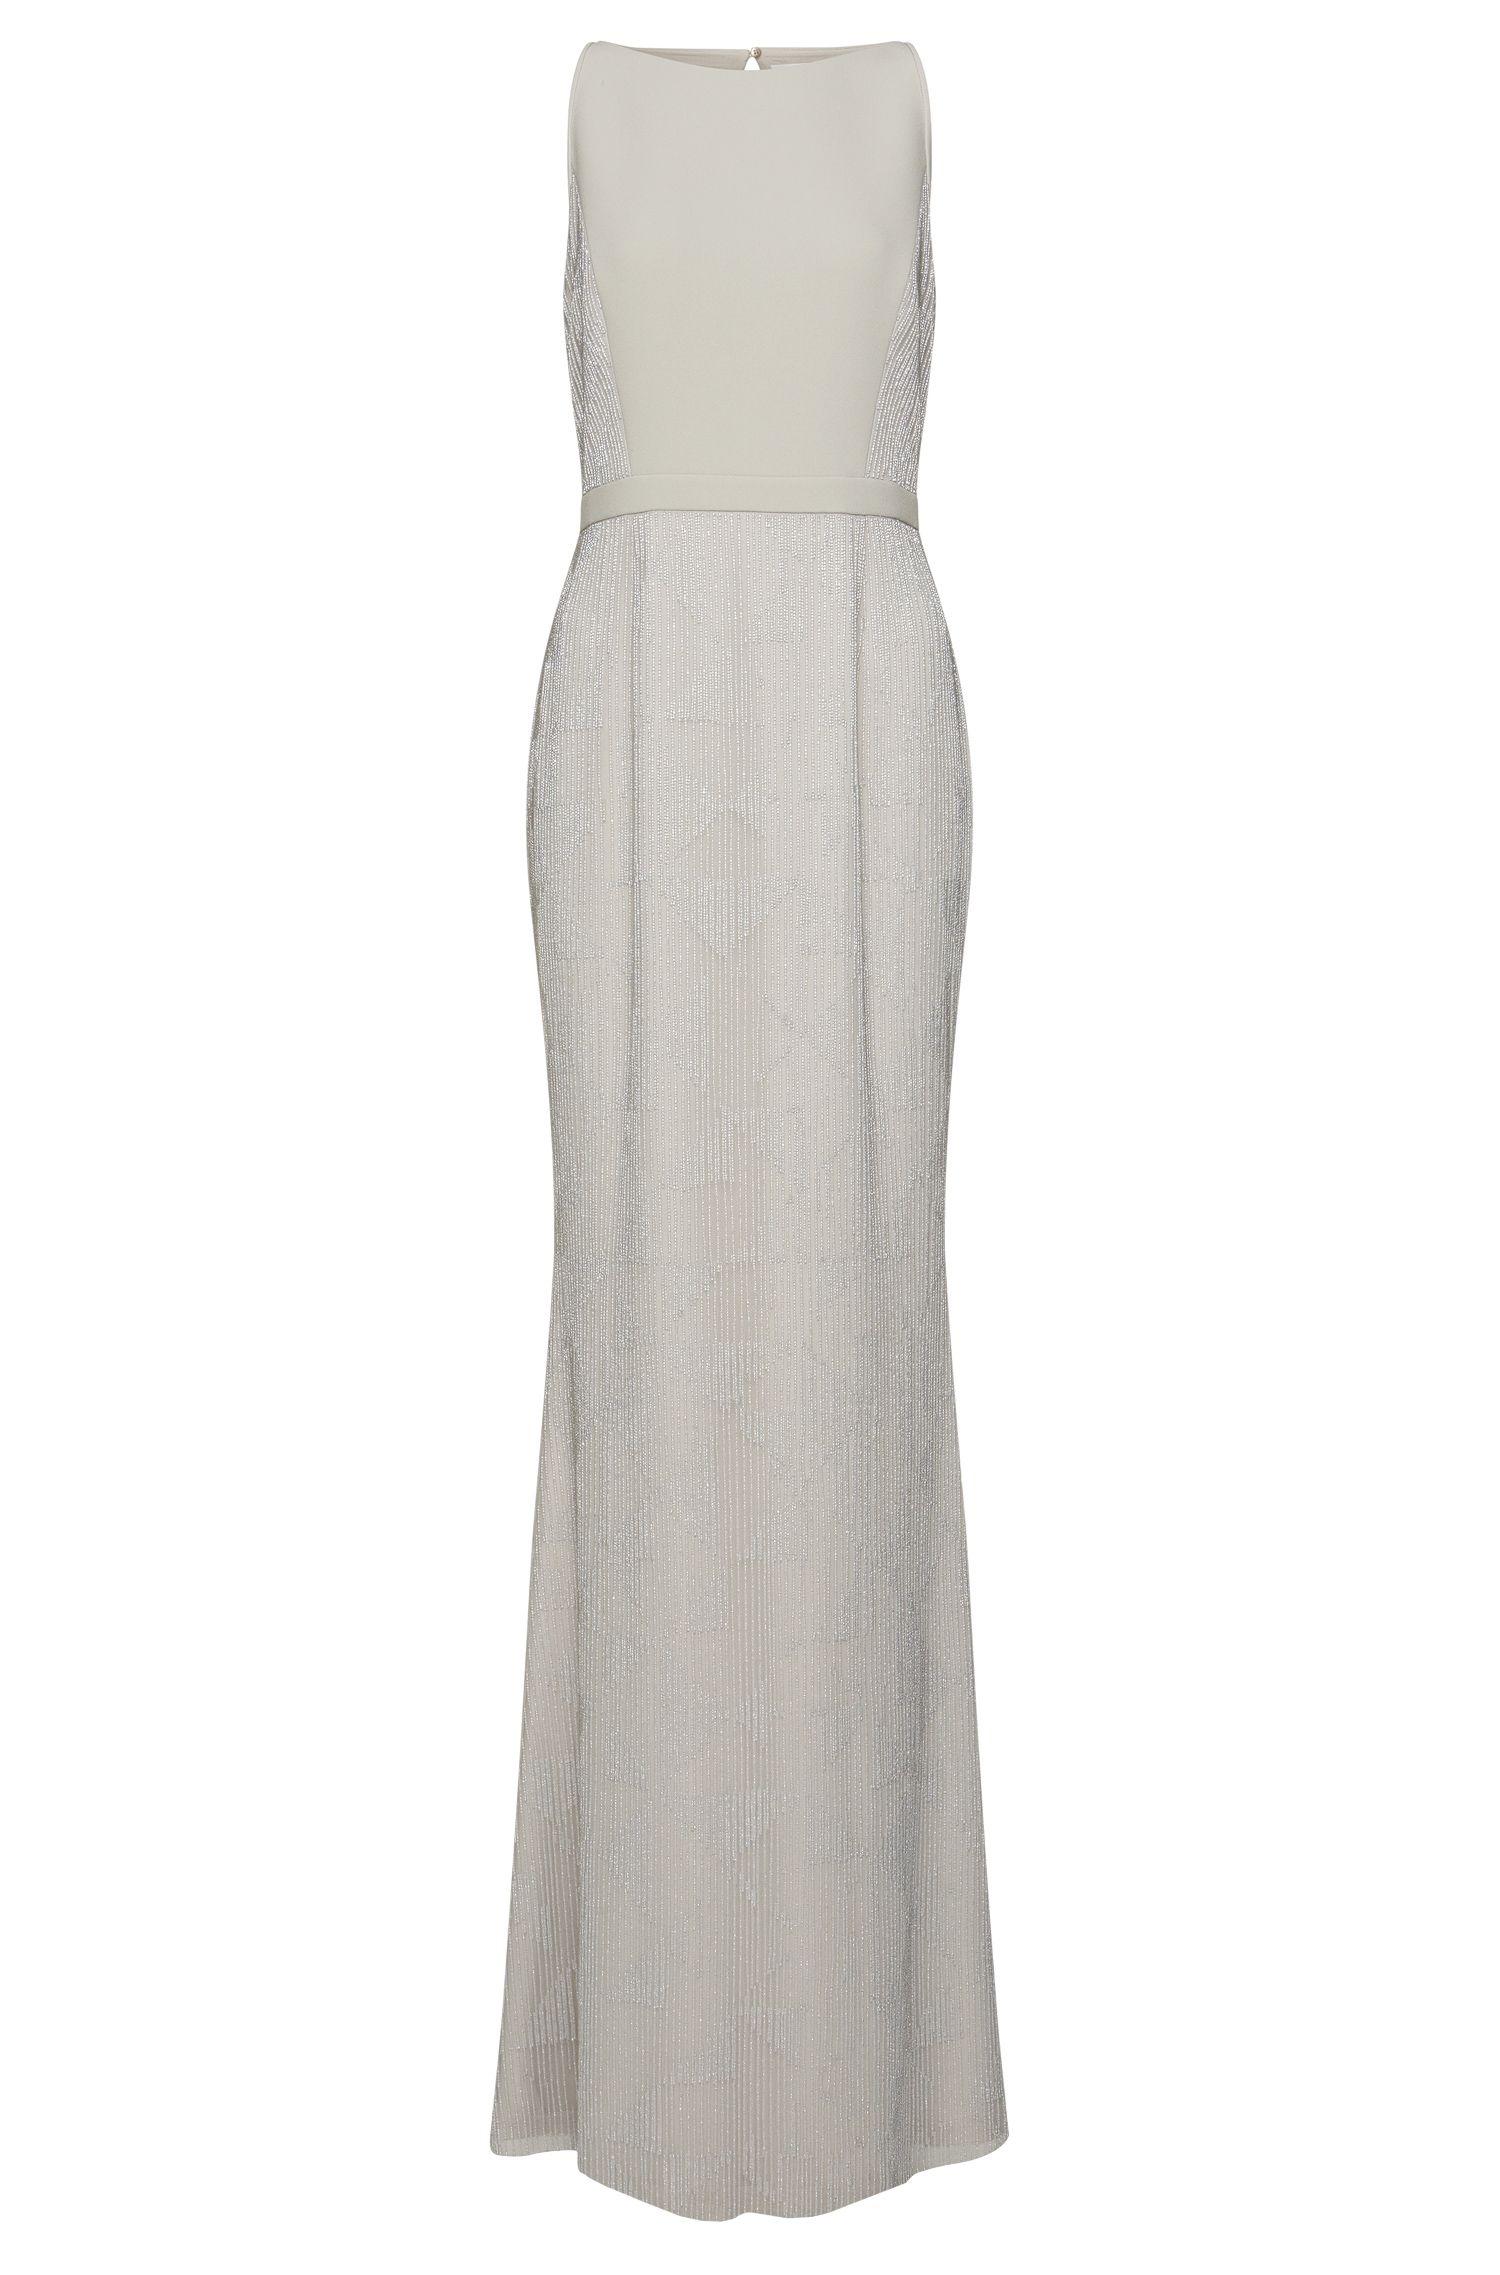 'Dovenala' | Silk Hand-Beaded Gown